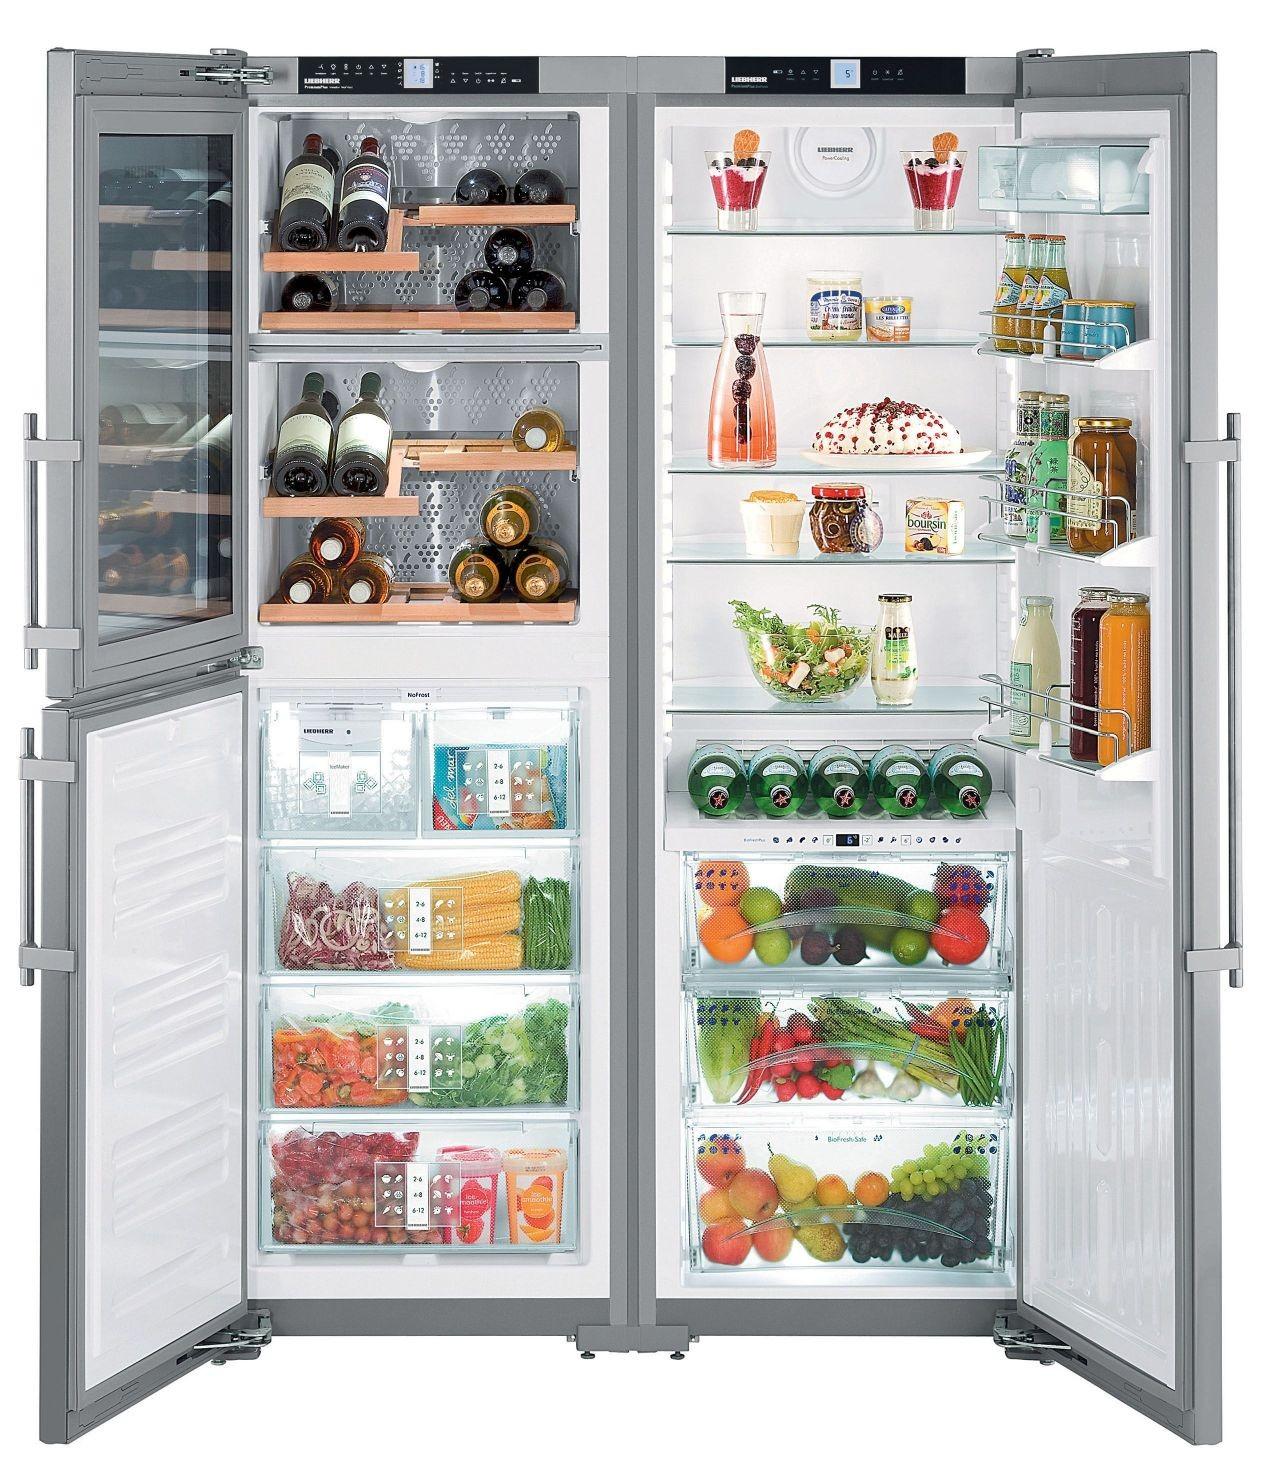 reparatii frigidere bucuresti , frigidere service, Reparatii frigider Bucuresti